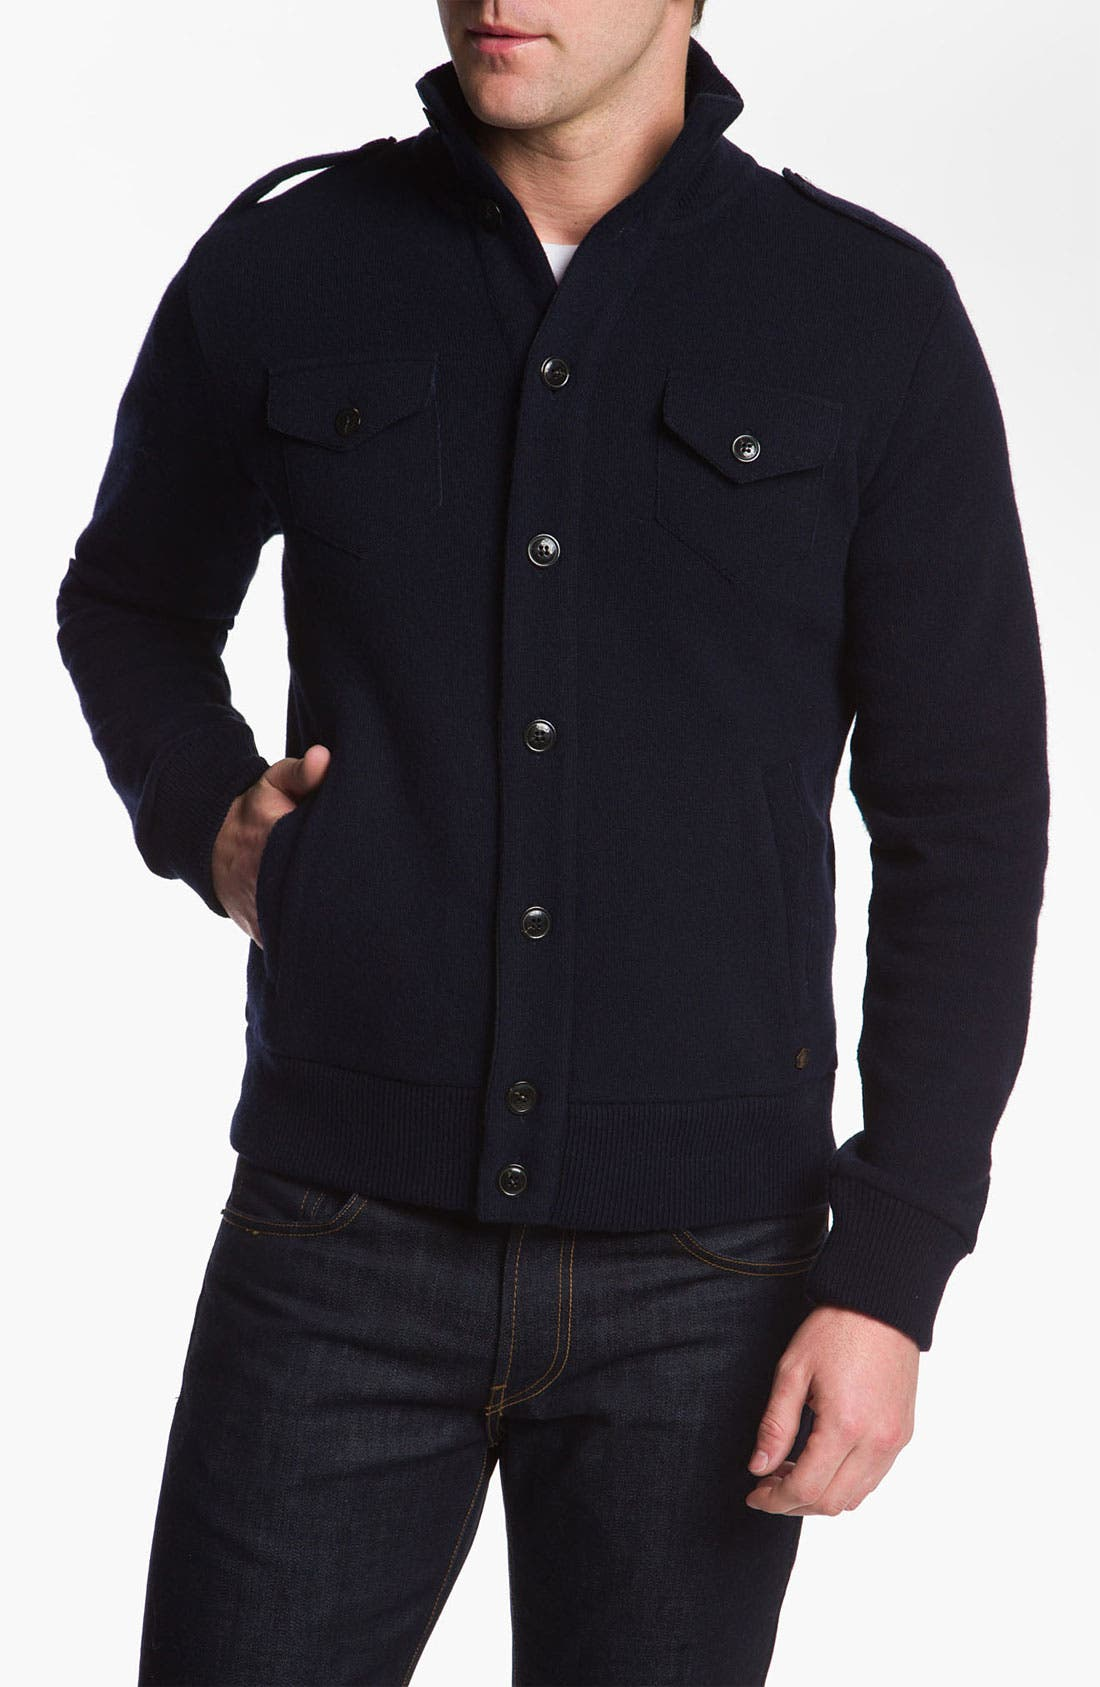 Alternate Image 1 Selected - Woolrich John Rich Wool Blend Button Cardigan